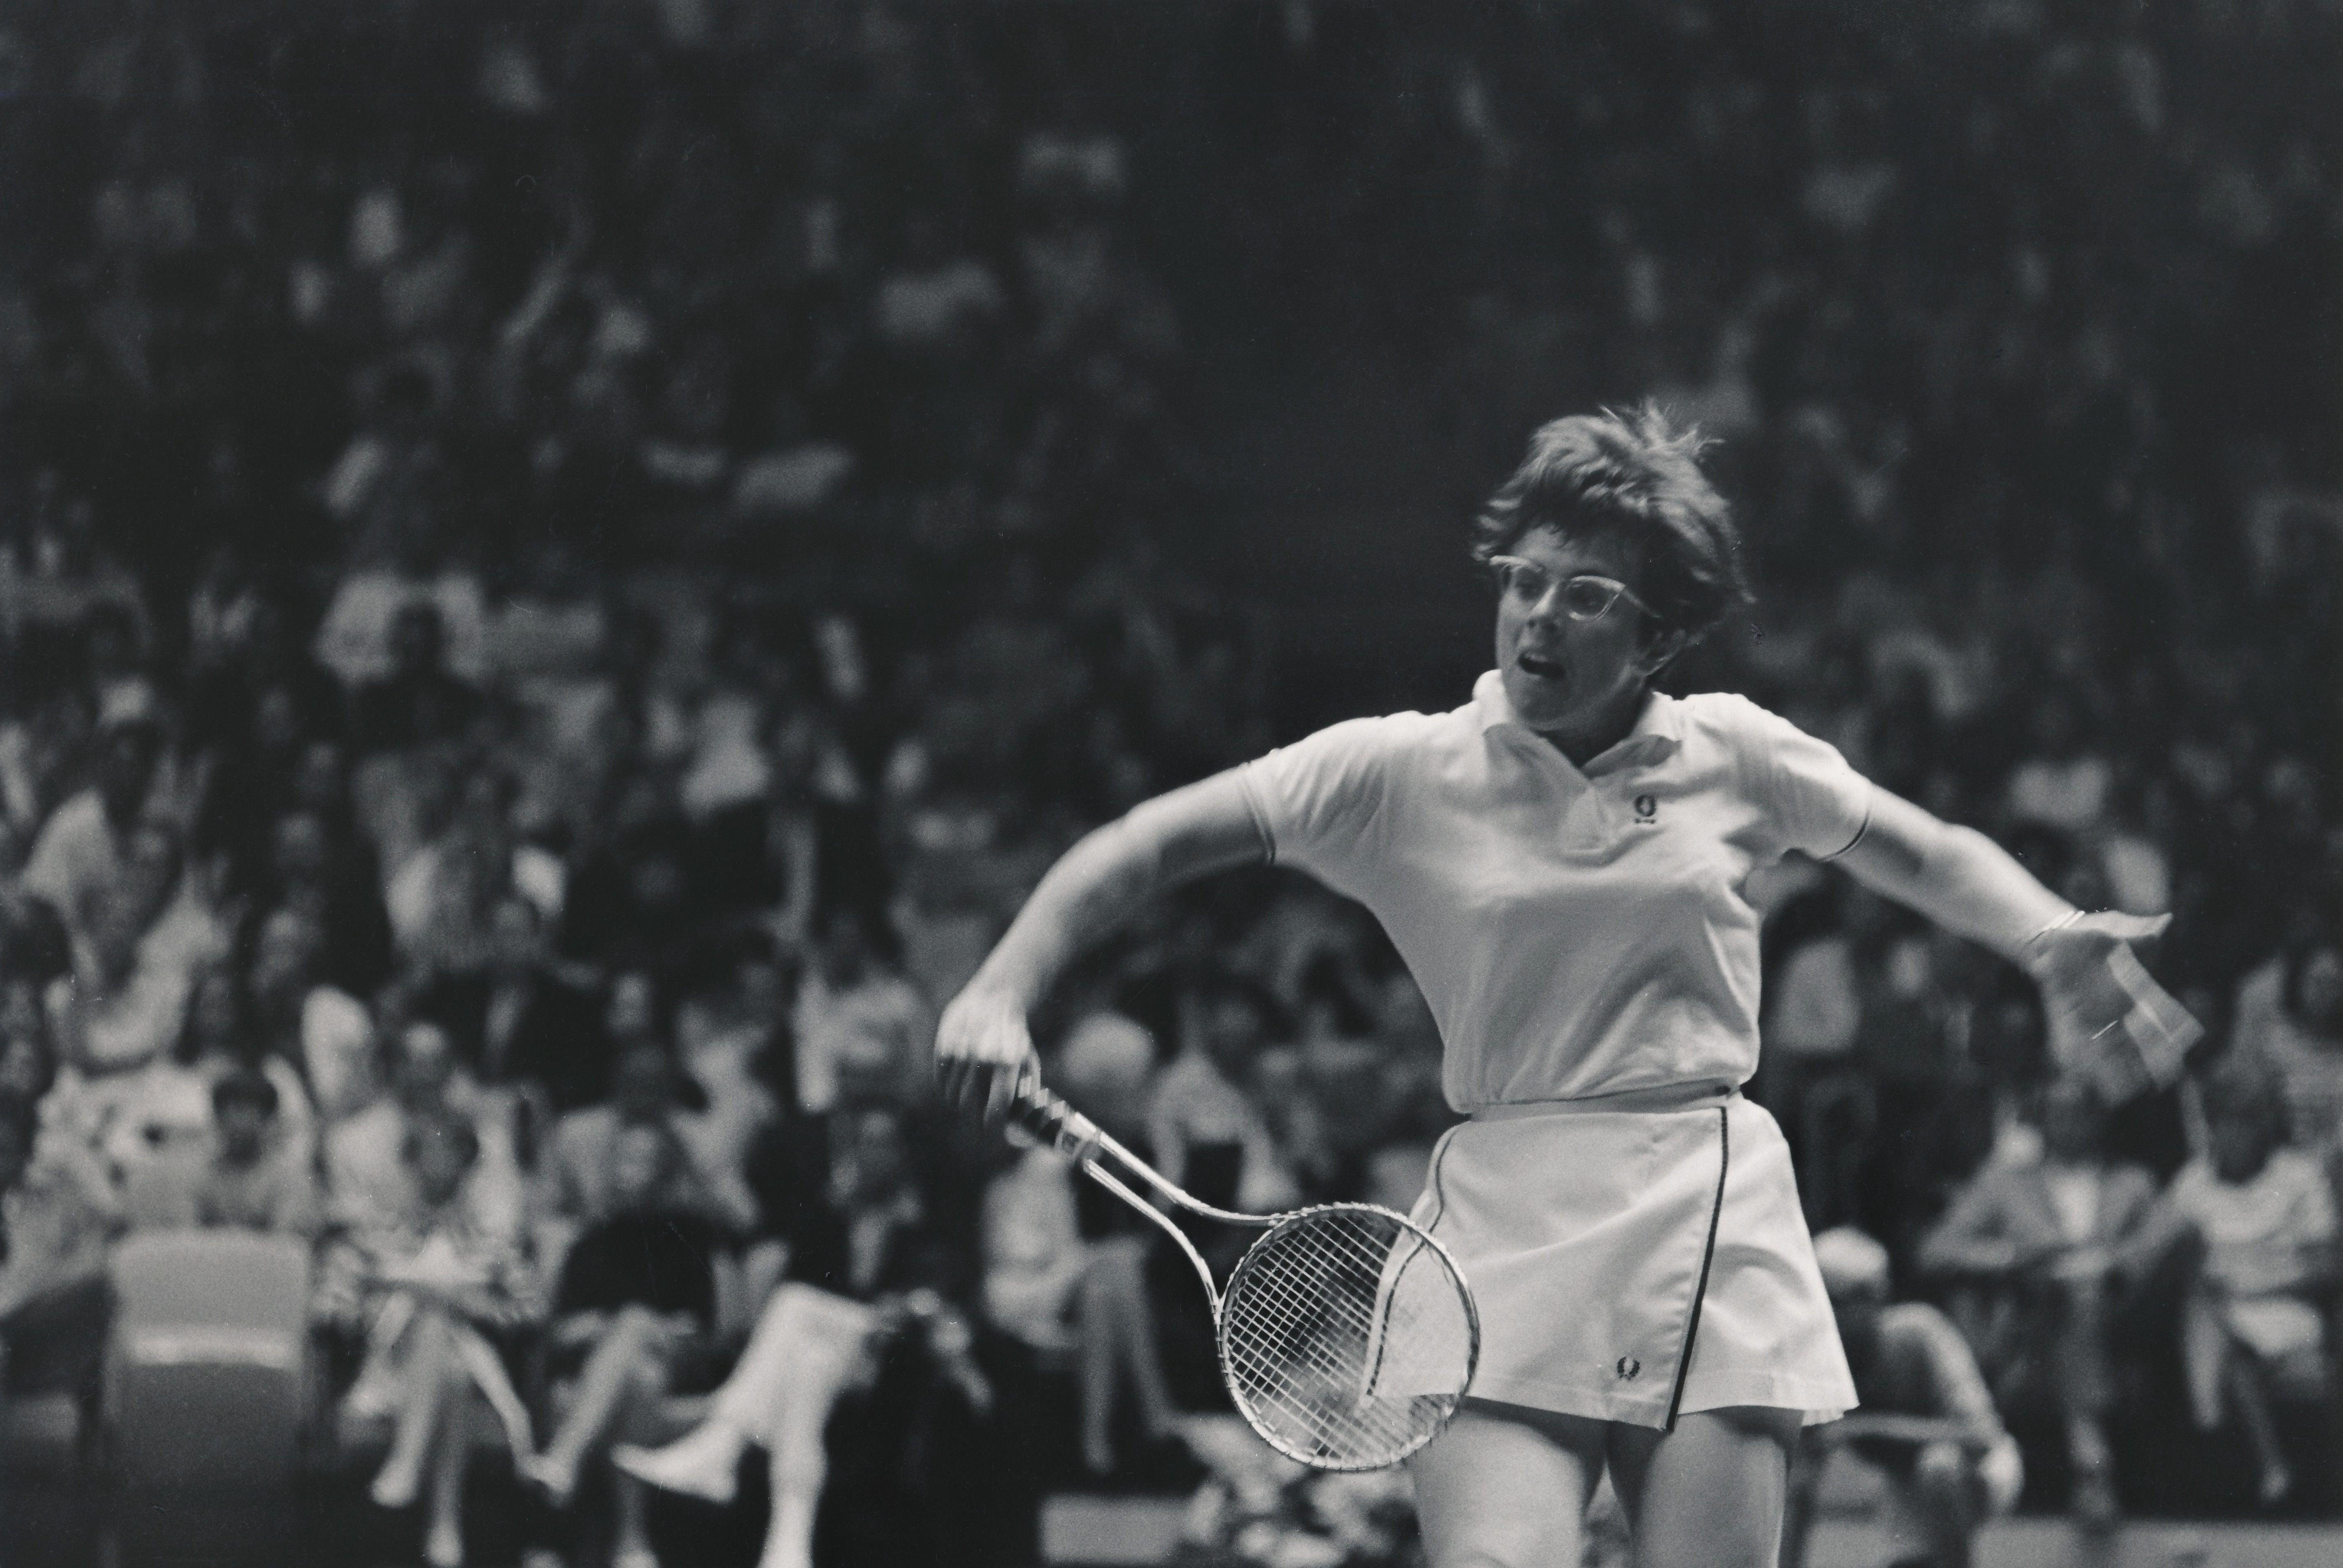 Forum on this topic: Eileen Erskine, billie-jean-king-12-grand-slam-singles/